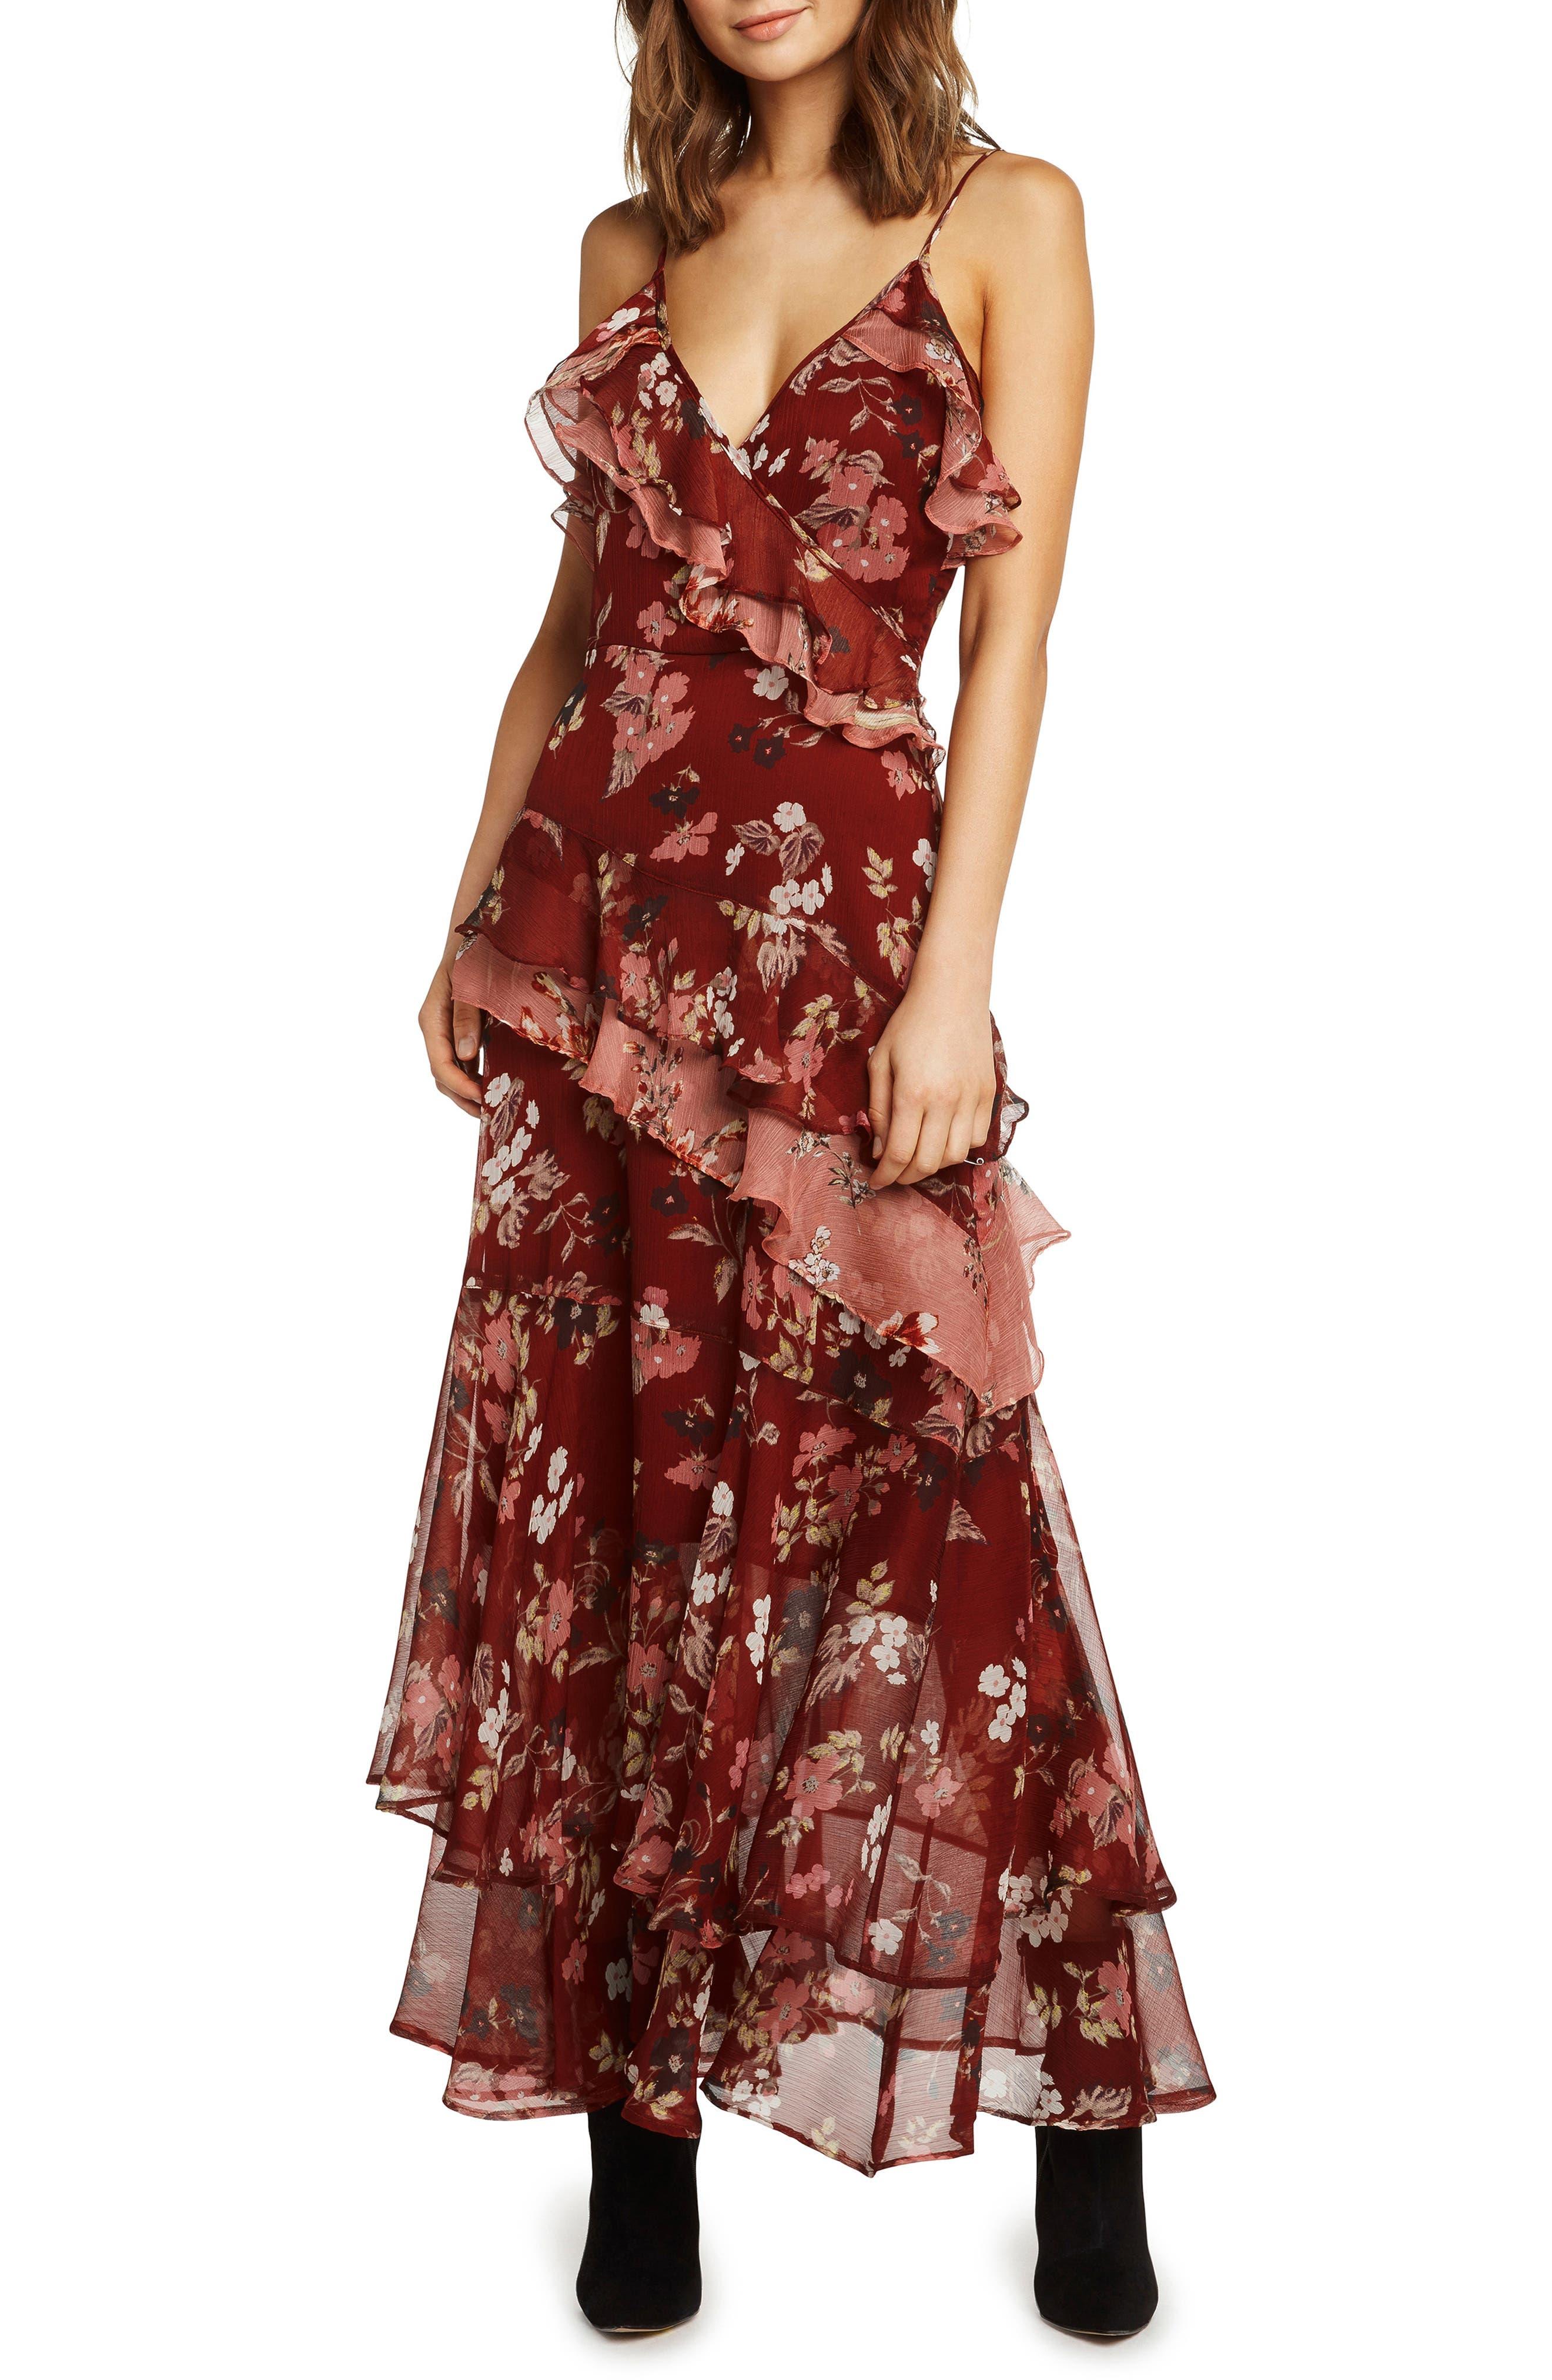 WILLOW & CLAY,                             Tiered Ruffle Maxi Dress,                             Main thumbnail 1, color,                             609